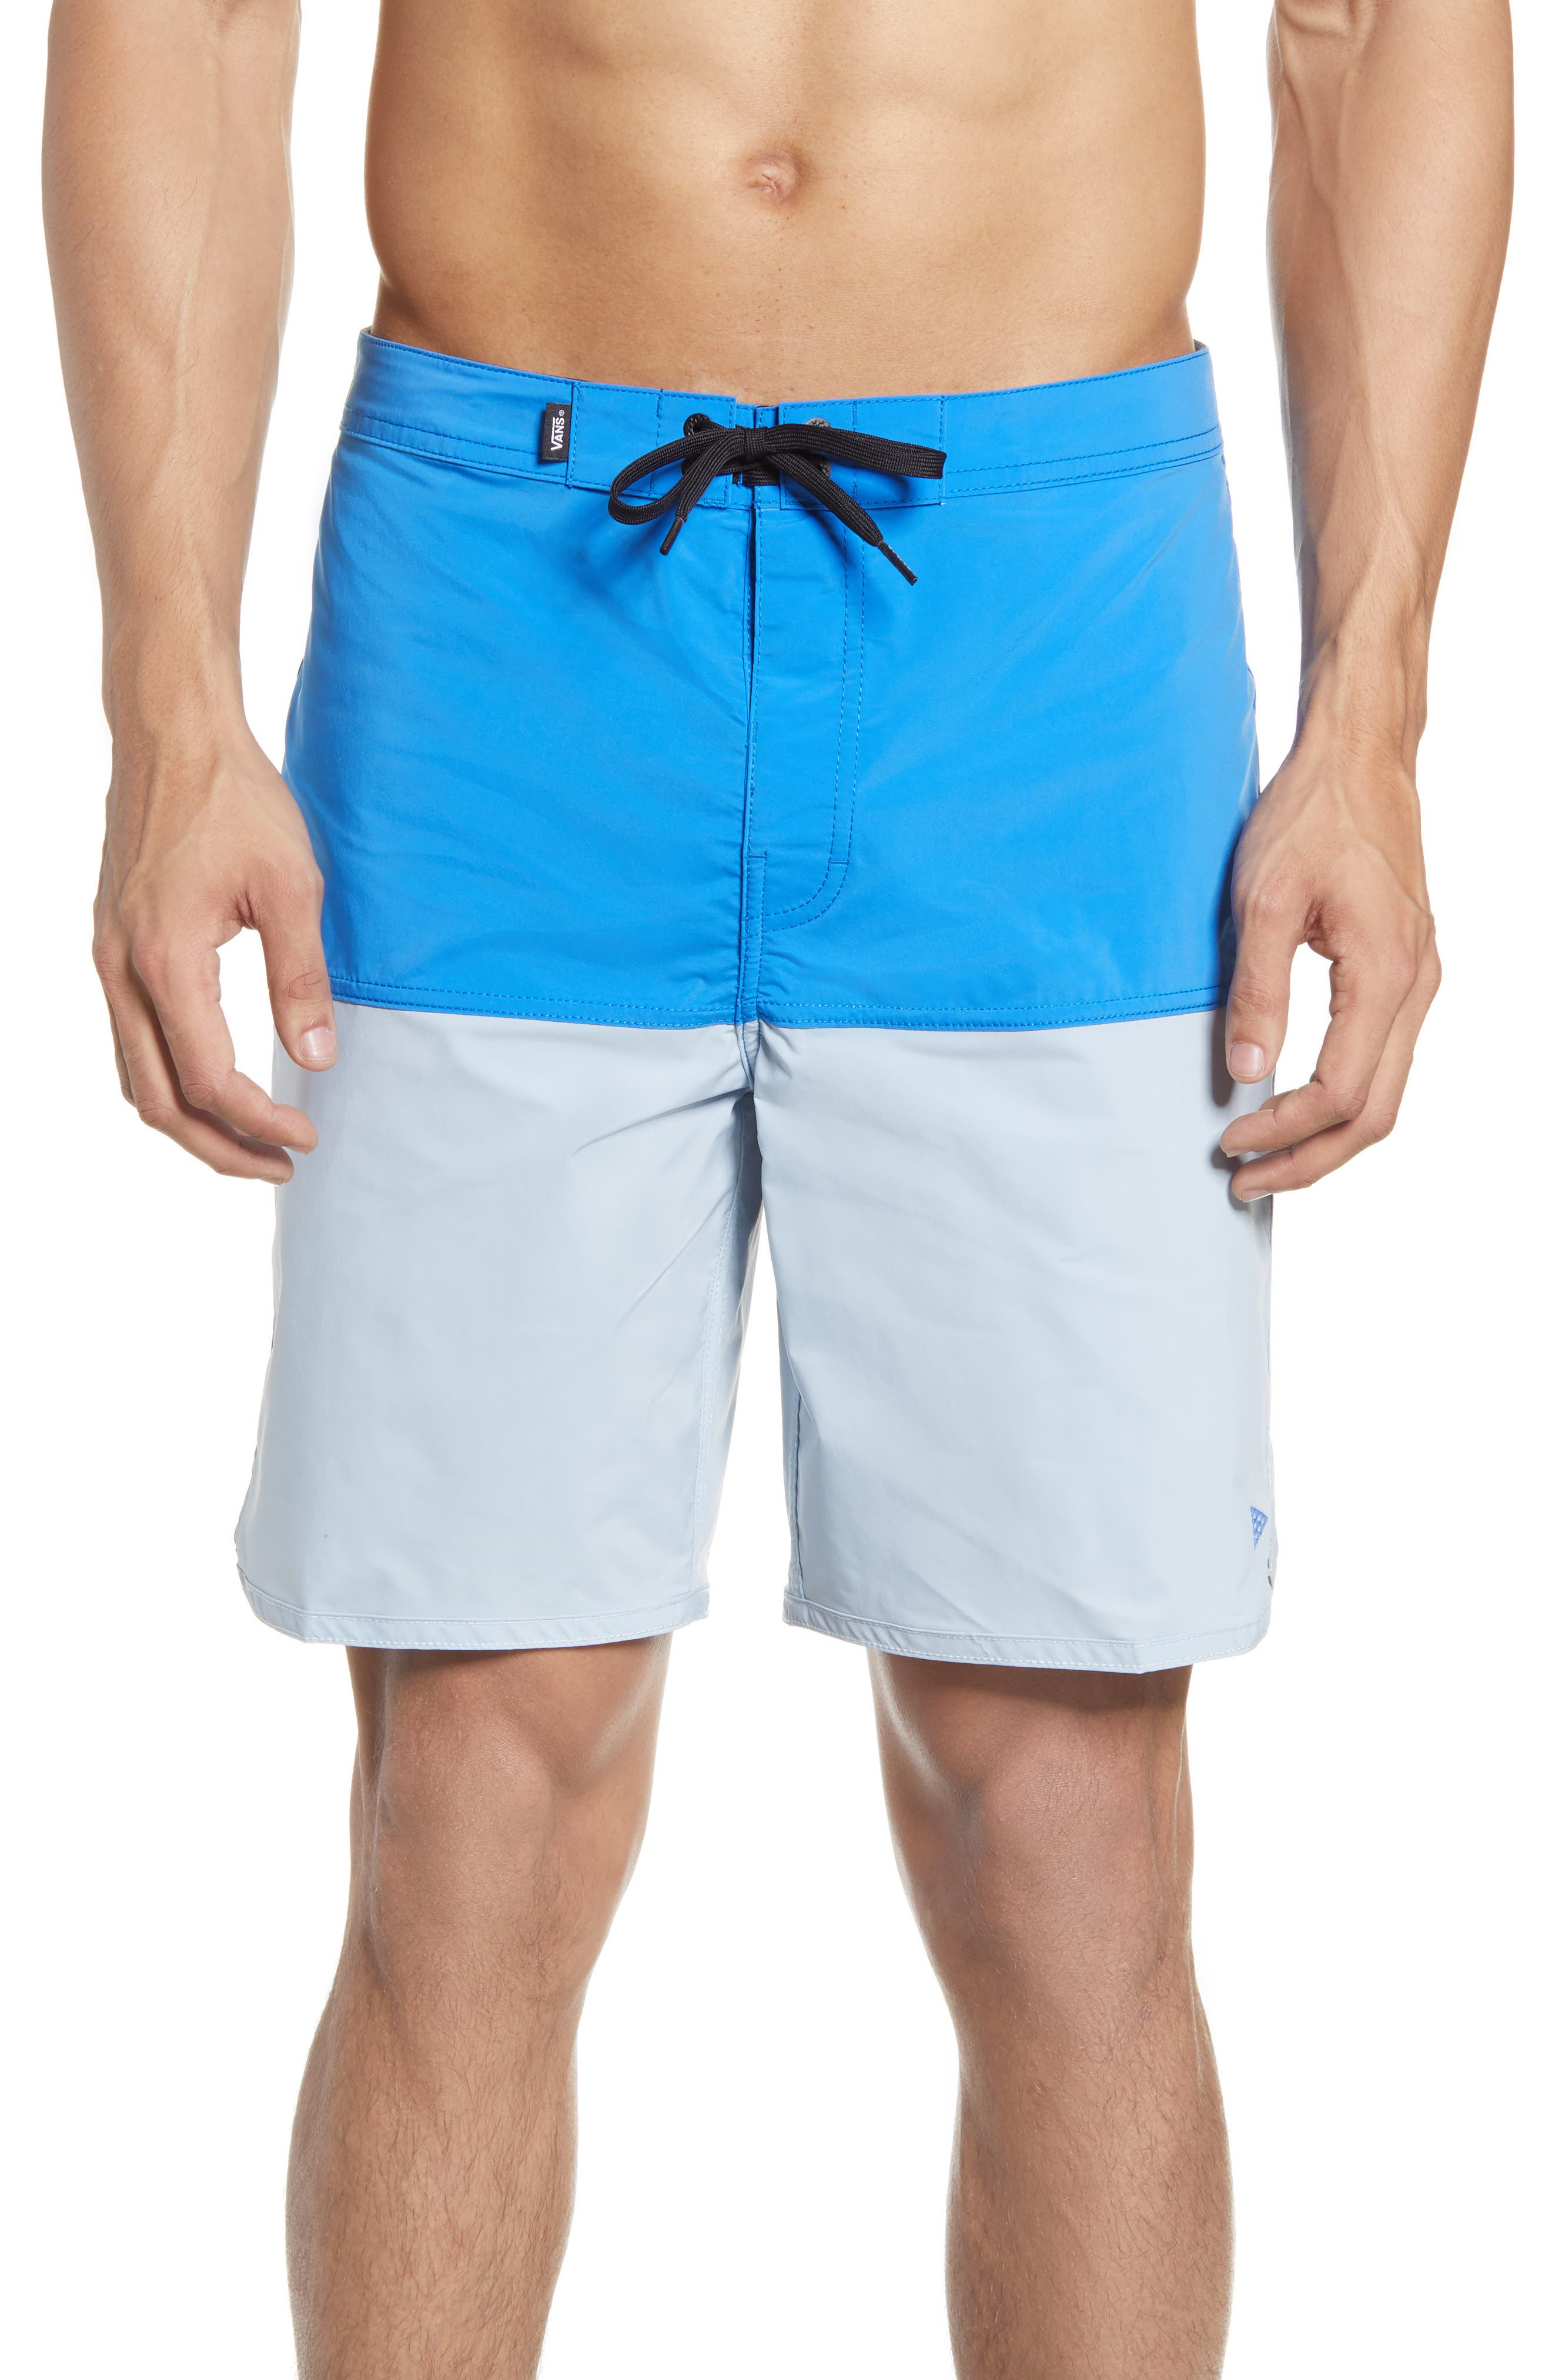 Cocker Spaniel Mens Swim Trunks Quick Dry Beach Swim Shorts